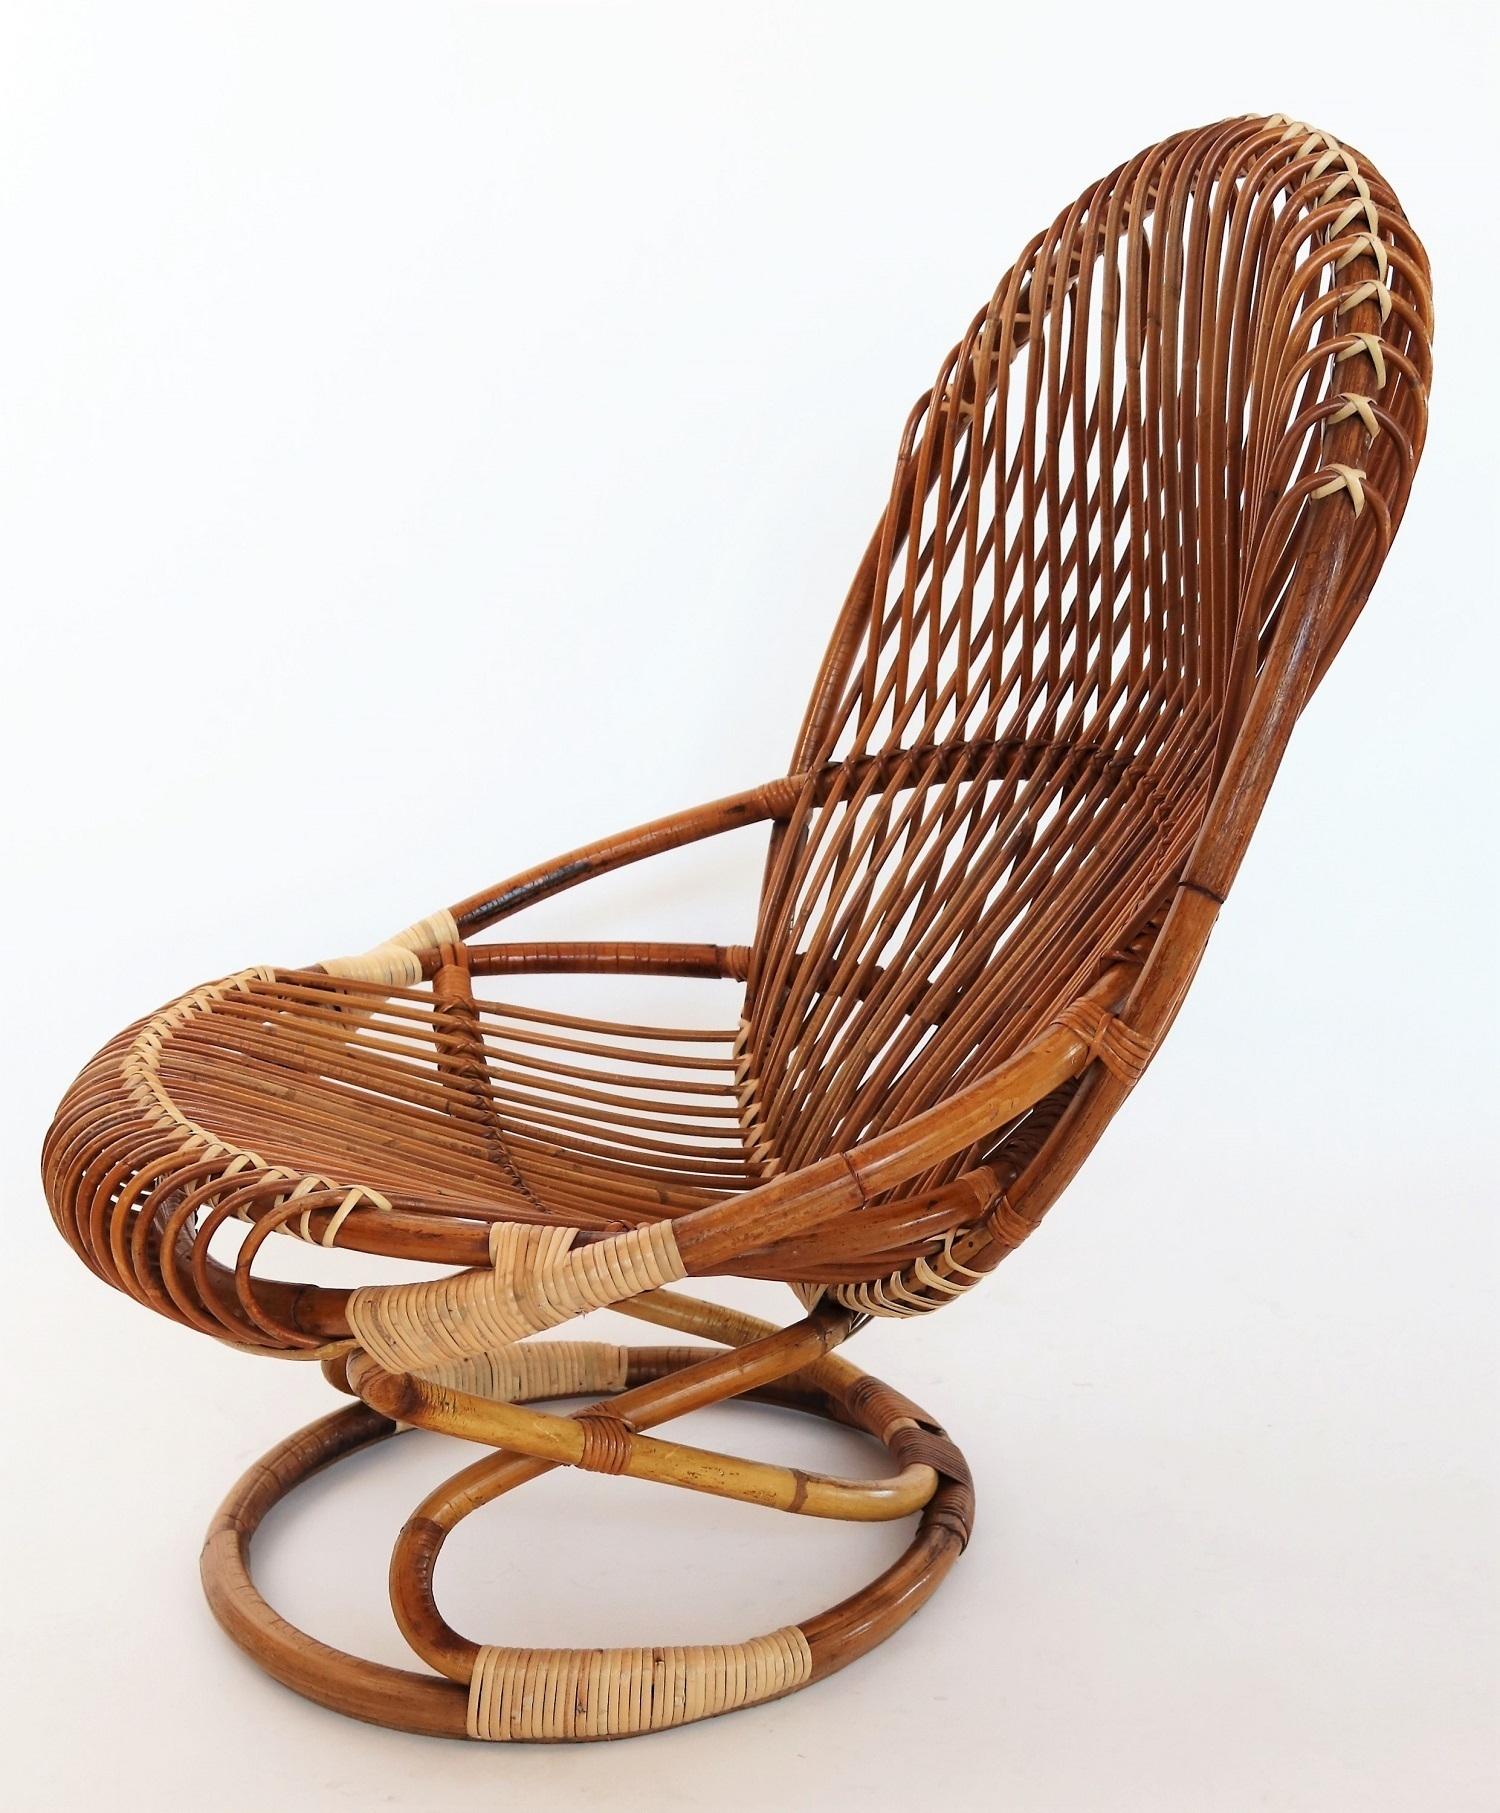 Italian Midcentury Bamboo Wicker Chair By Giovanni Travasa For Bonacina 1950s